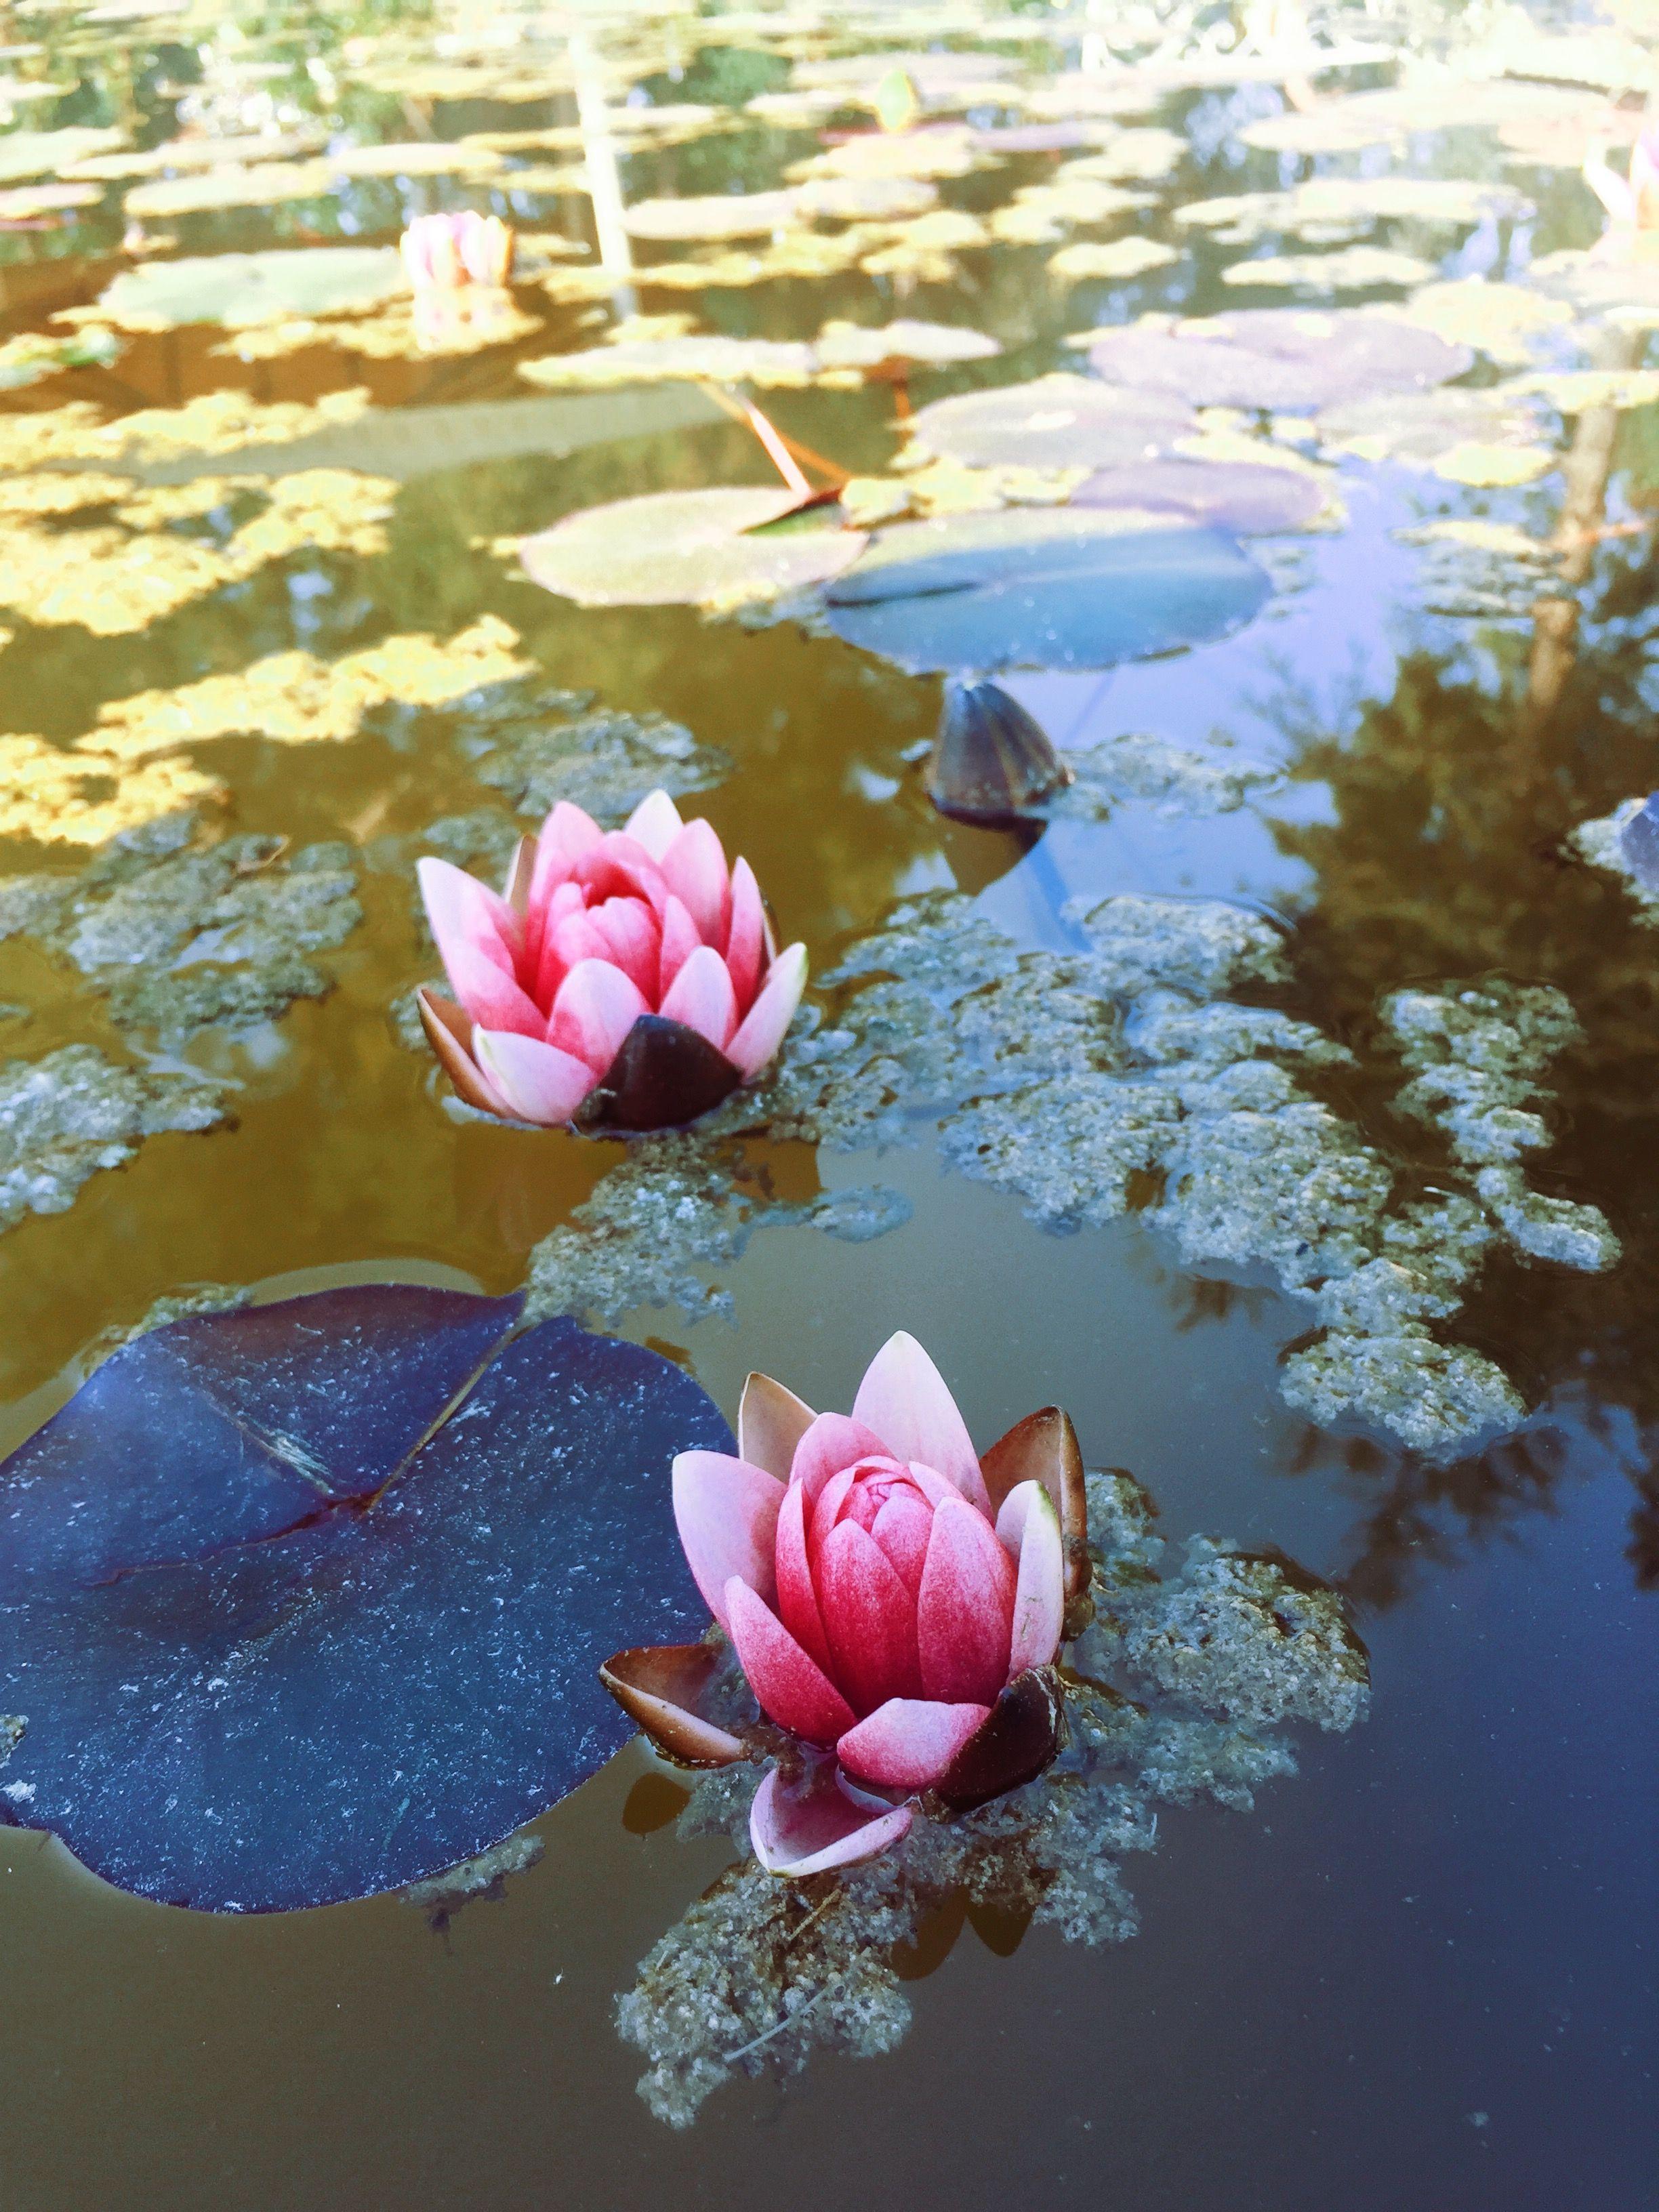 Pin by ozge izdal on god is dead pinterest lotus flower izmirmasajfo